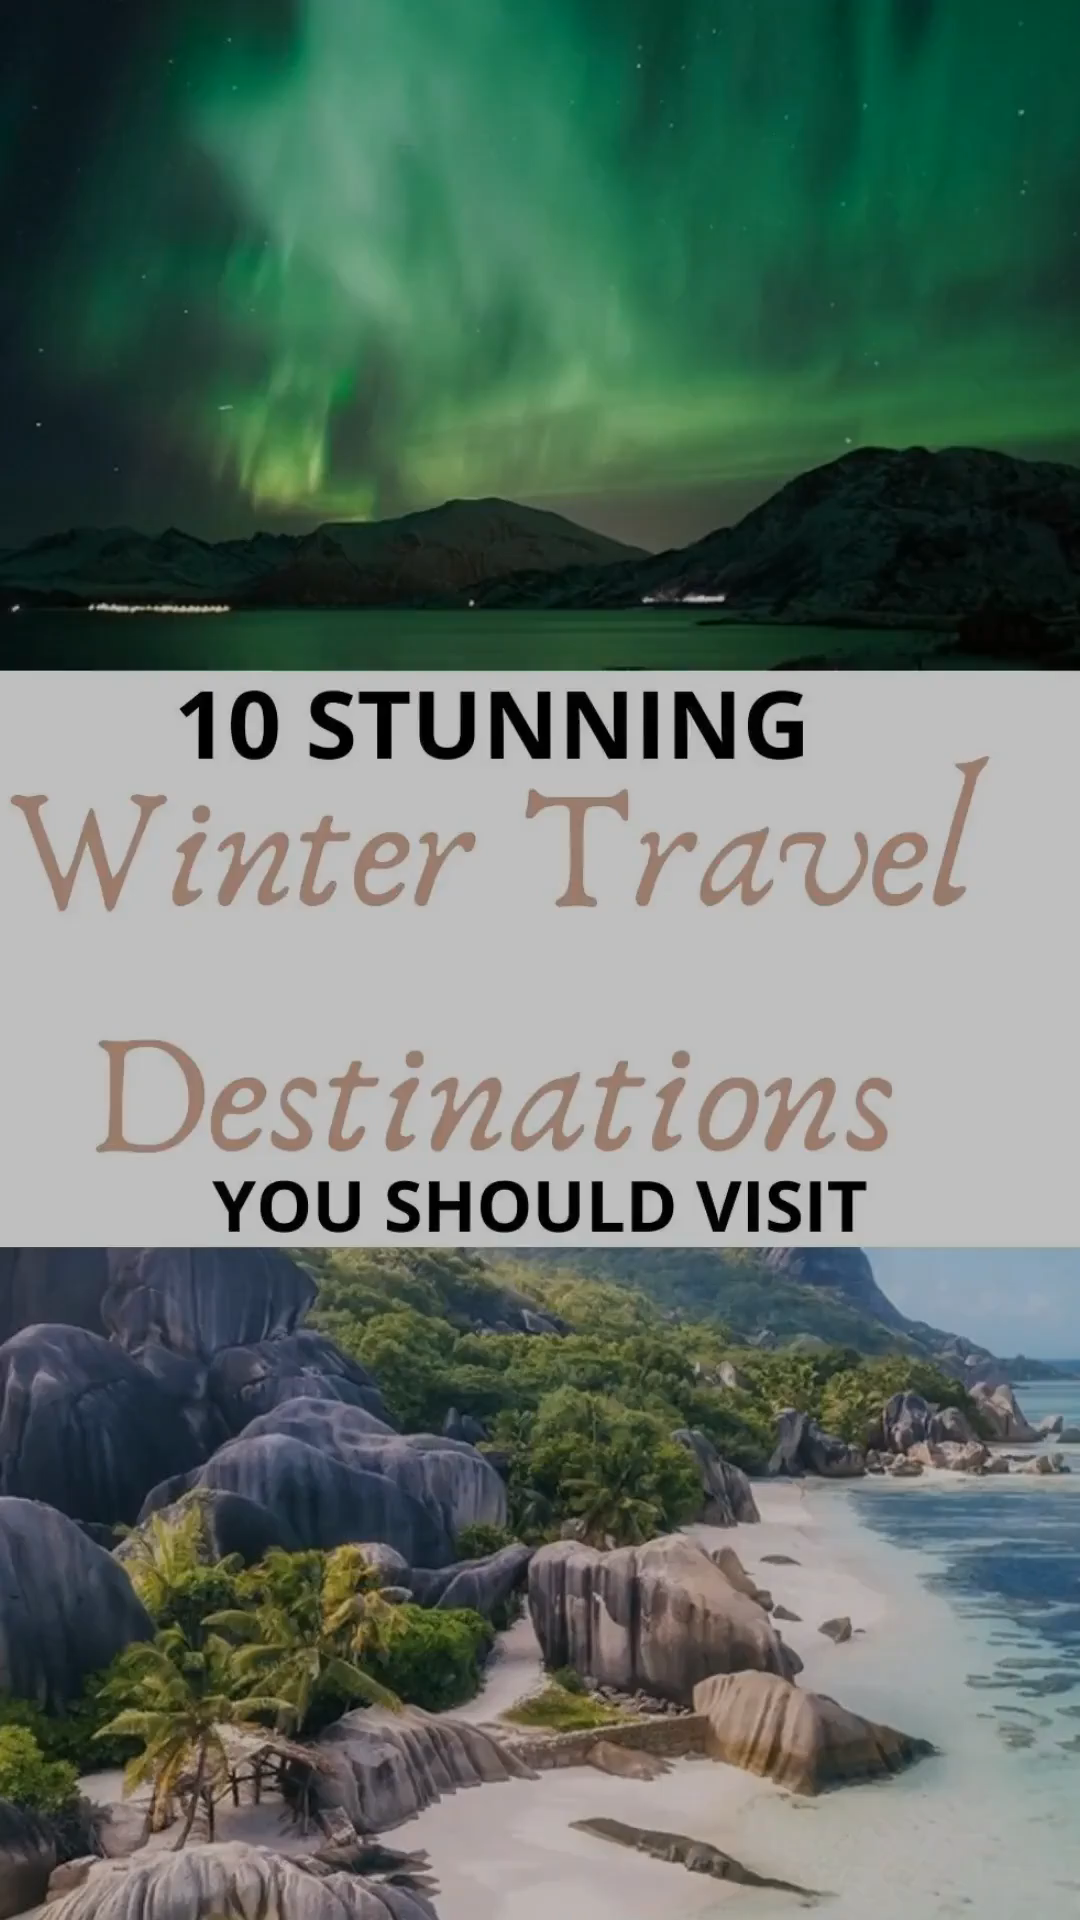 10 Stunning Winter Travel Destinations -   19 travel destinations Thailand country ideas